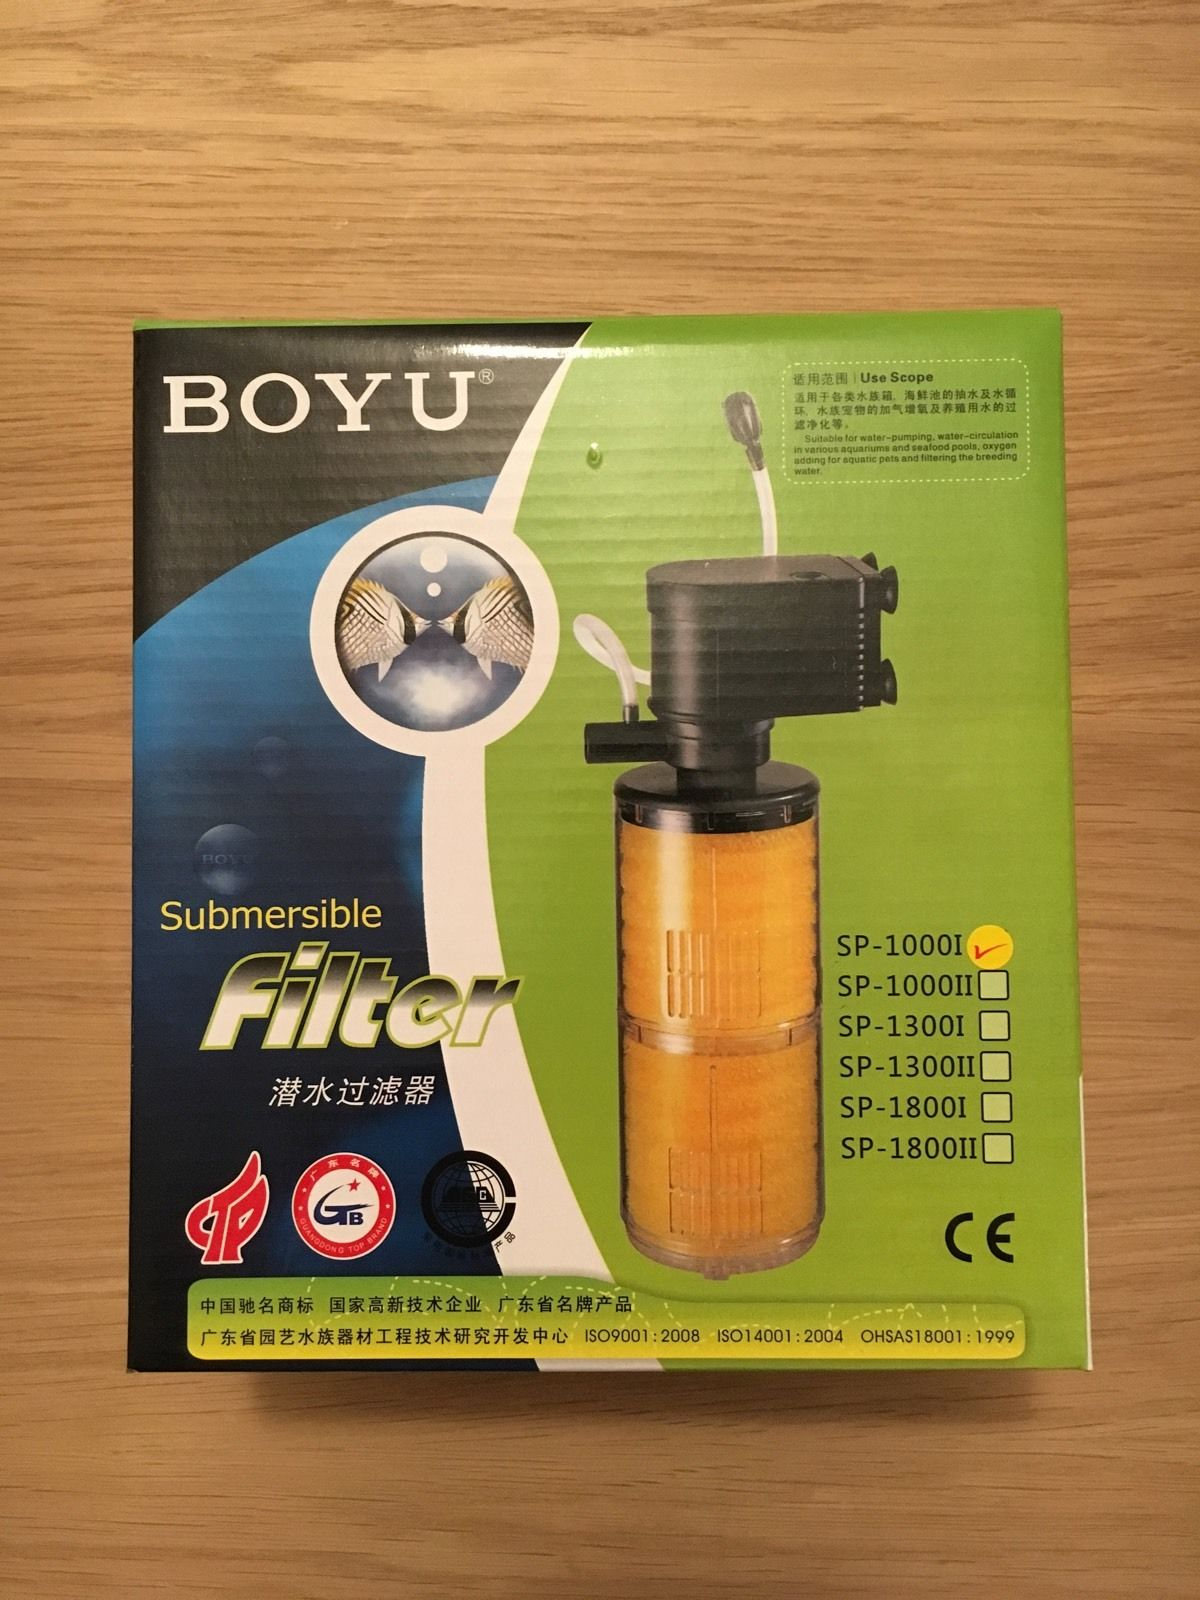 1000 l h aquarium fish tank powerhead jp 023 - Boyu Sp 1000i Submersible Aquarium Filter China Mainland